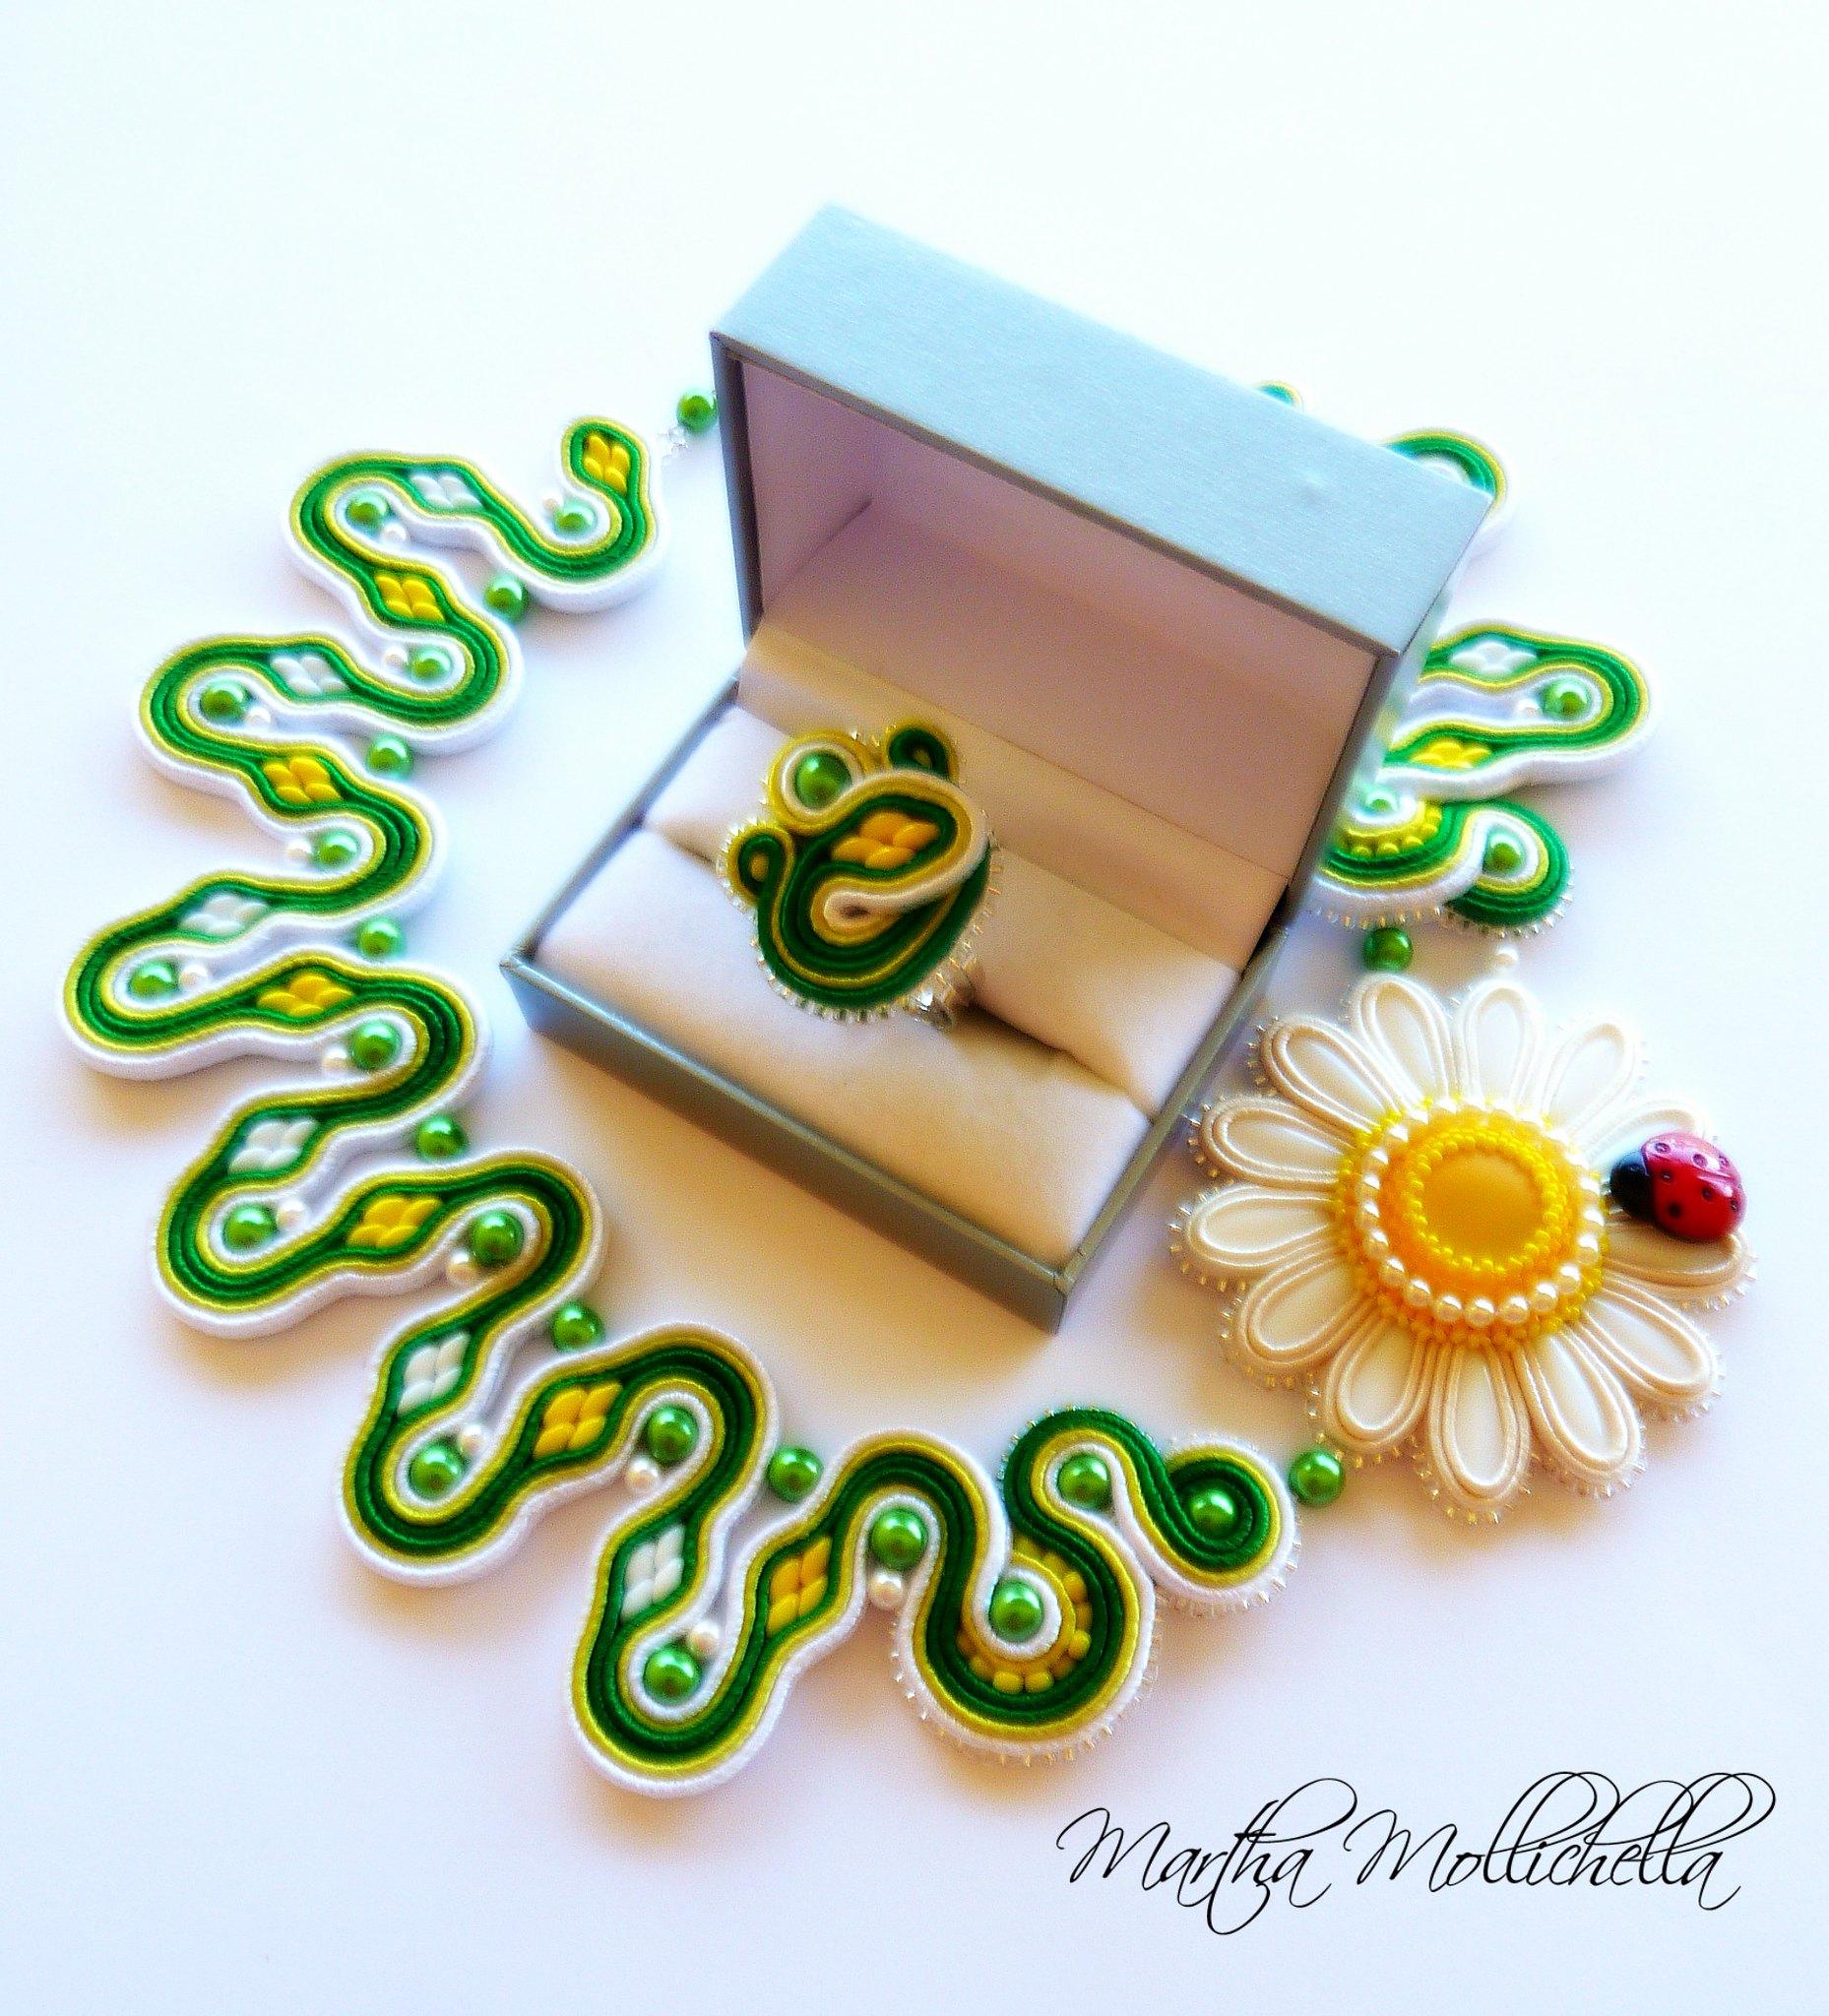 daisy soutache necklace handmade jewelry by Martha Mollichella soutache